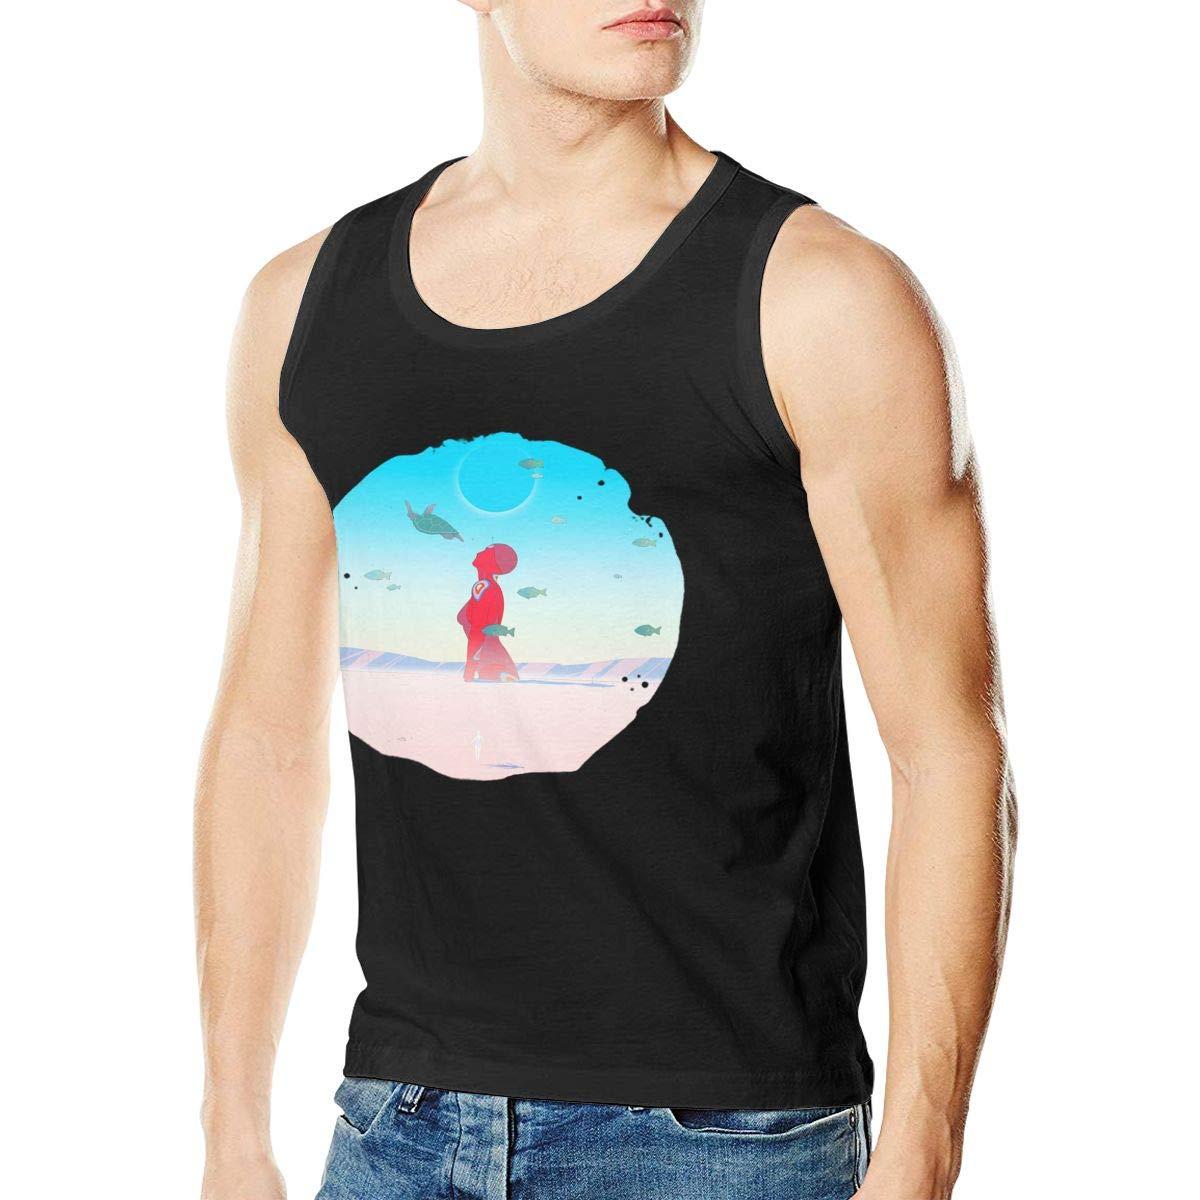 Dirty Heads Swim Team Man Sports Comfort Sleeveless Tank Vest Tee